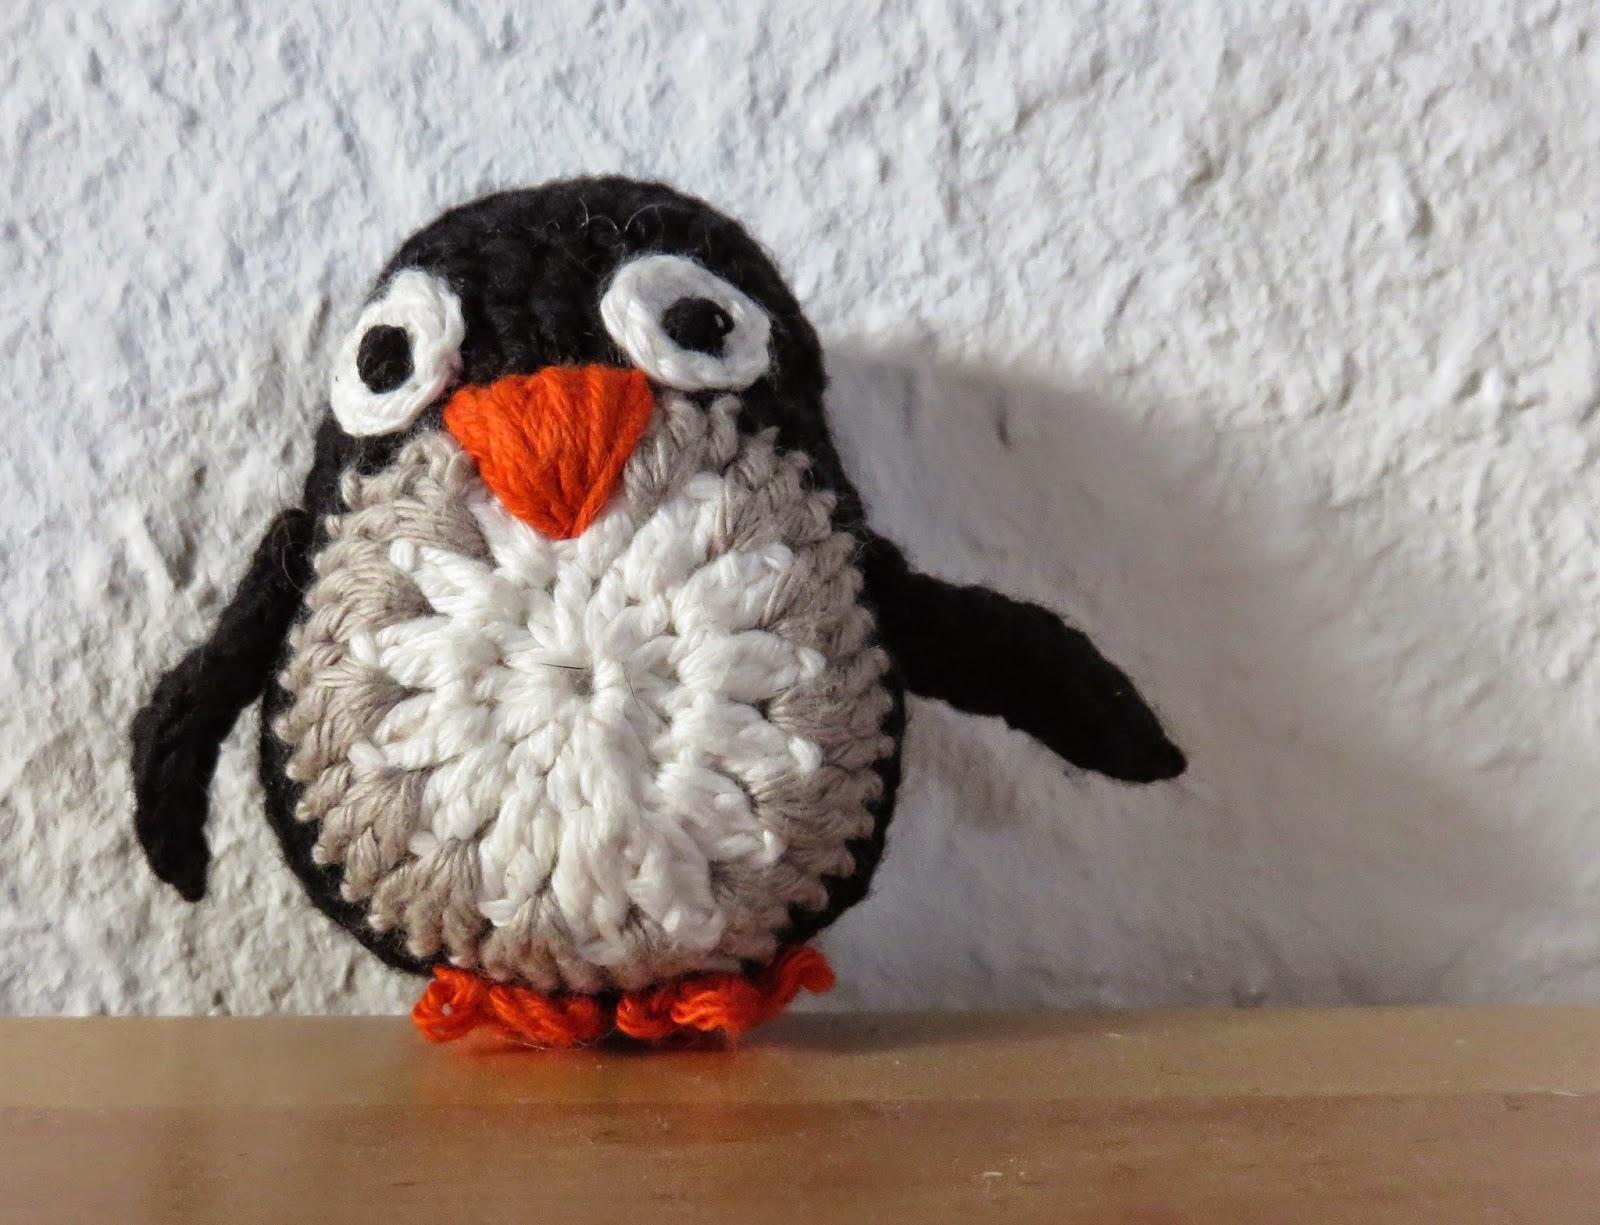 perleplader der har form som en pingvin